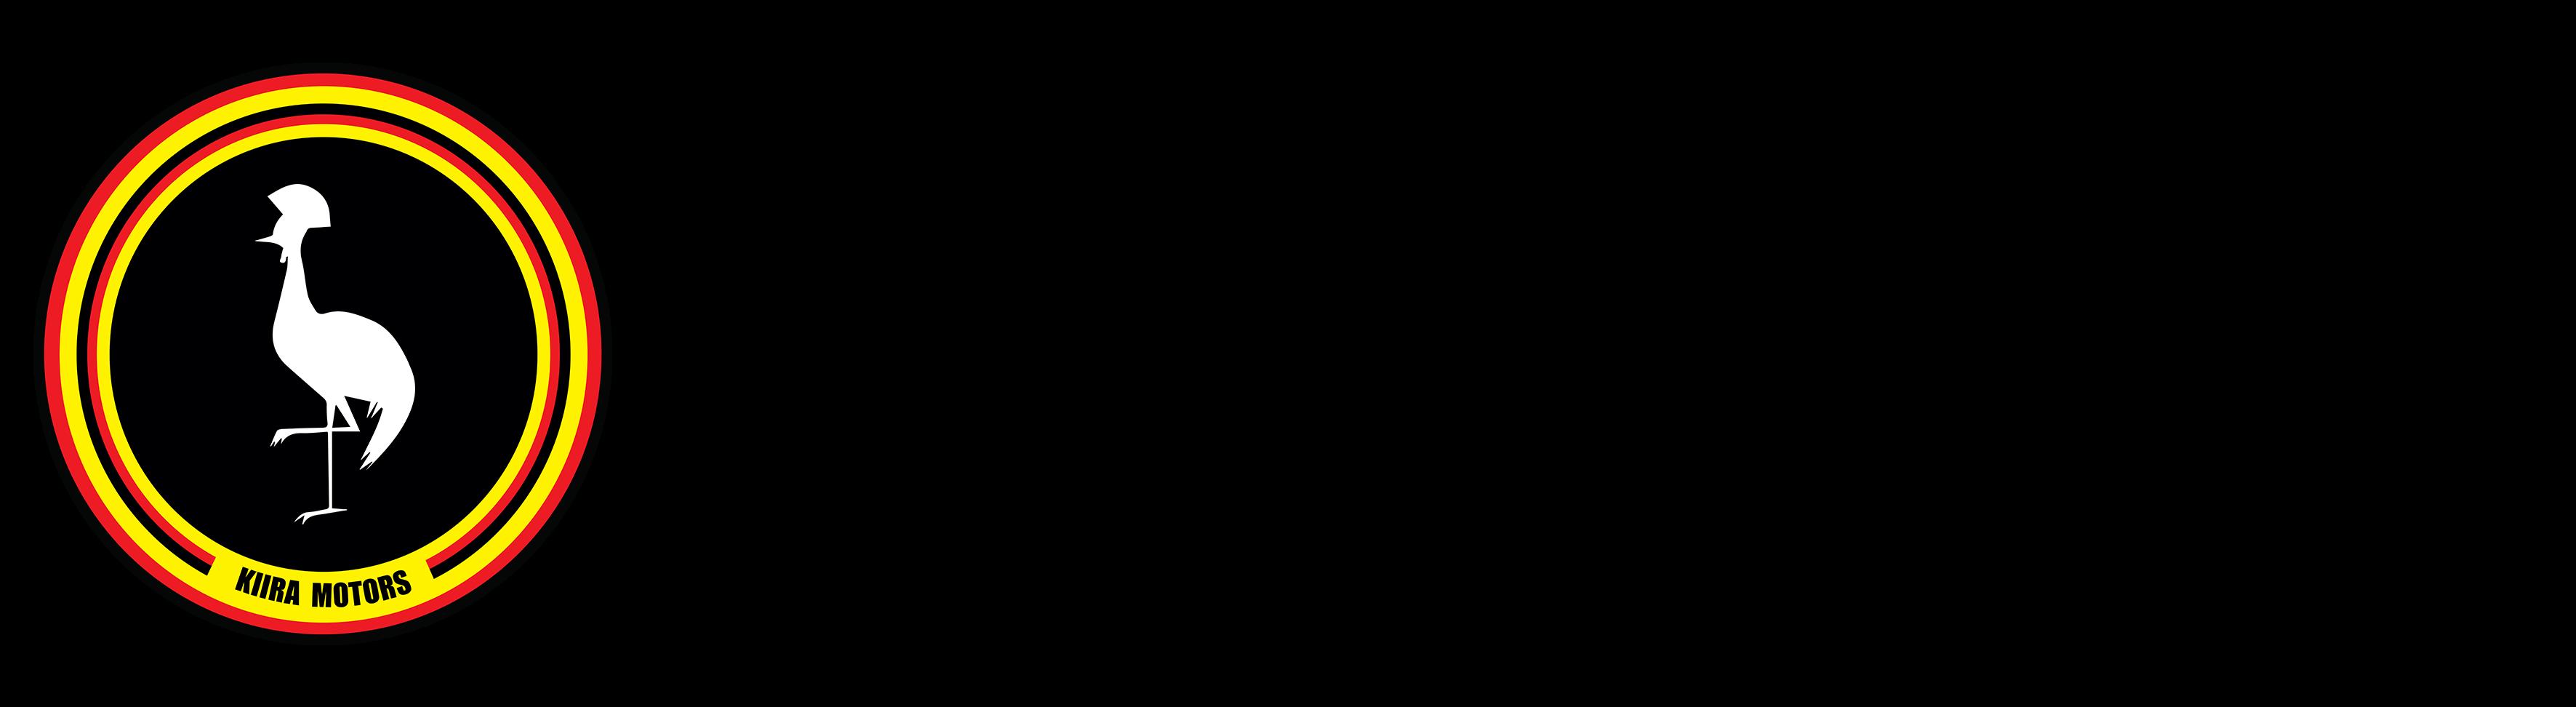 Logo von Kiira Motors Corporation Uganda